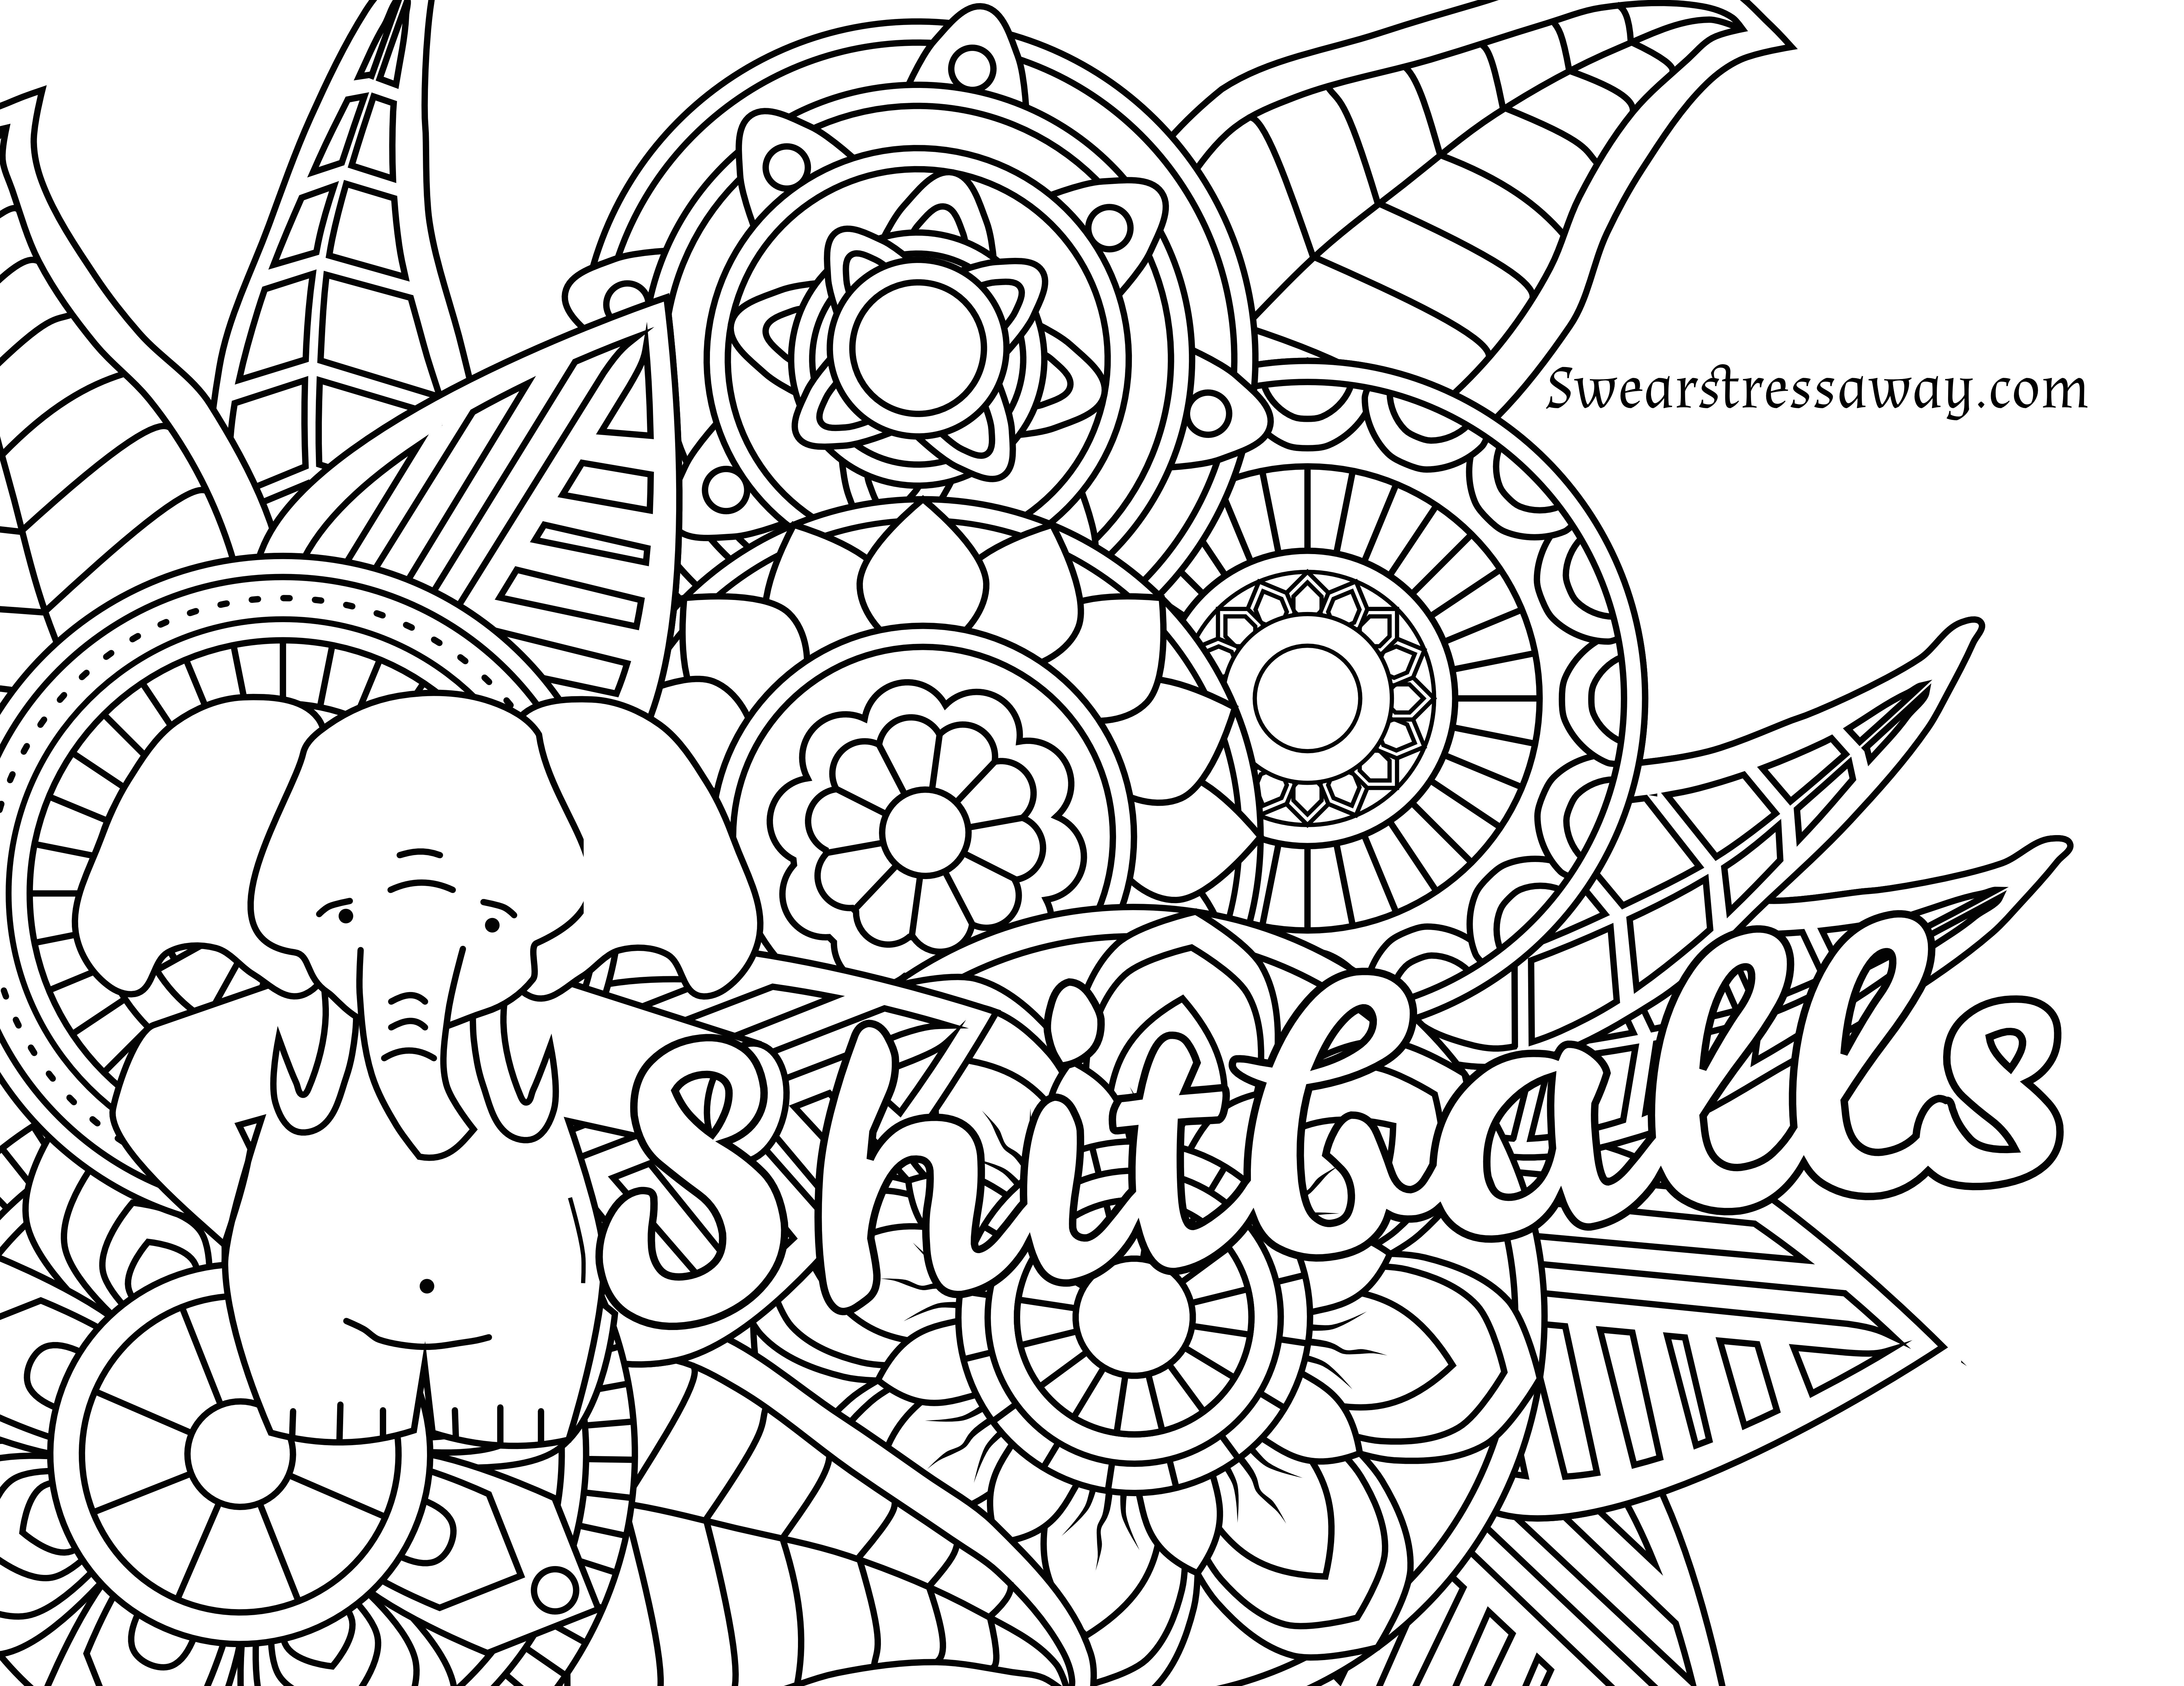 Free Printable Coloring Page - Shitballs - Swear Word Coloring Page - Swear Word Coloring Pages Printable Free